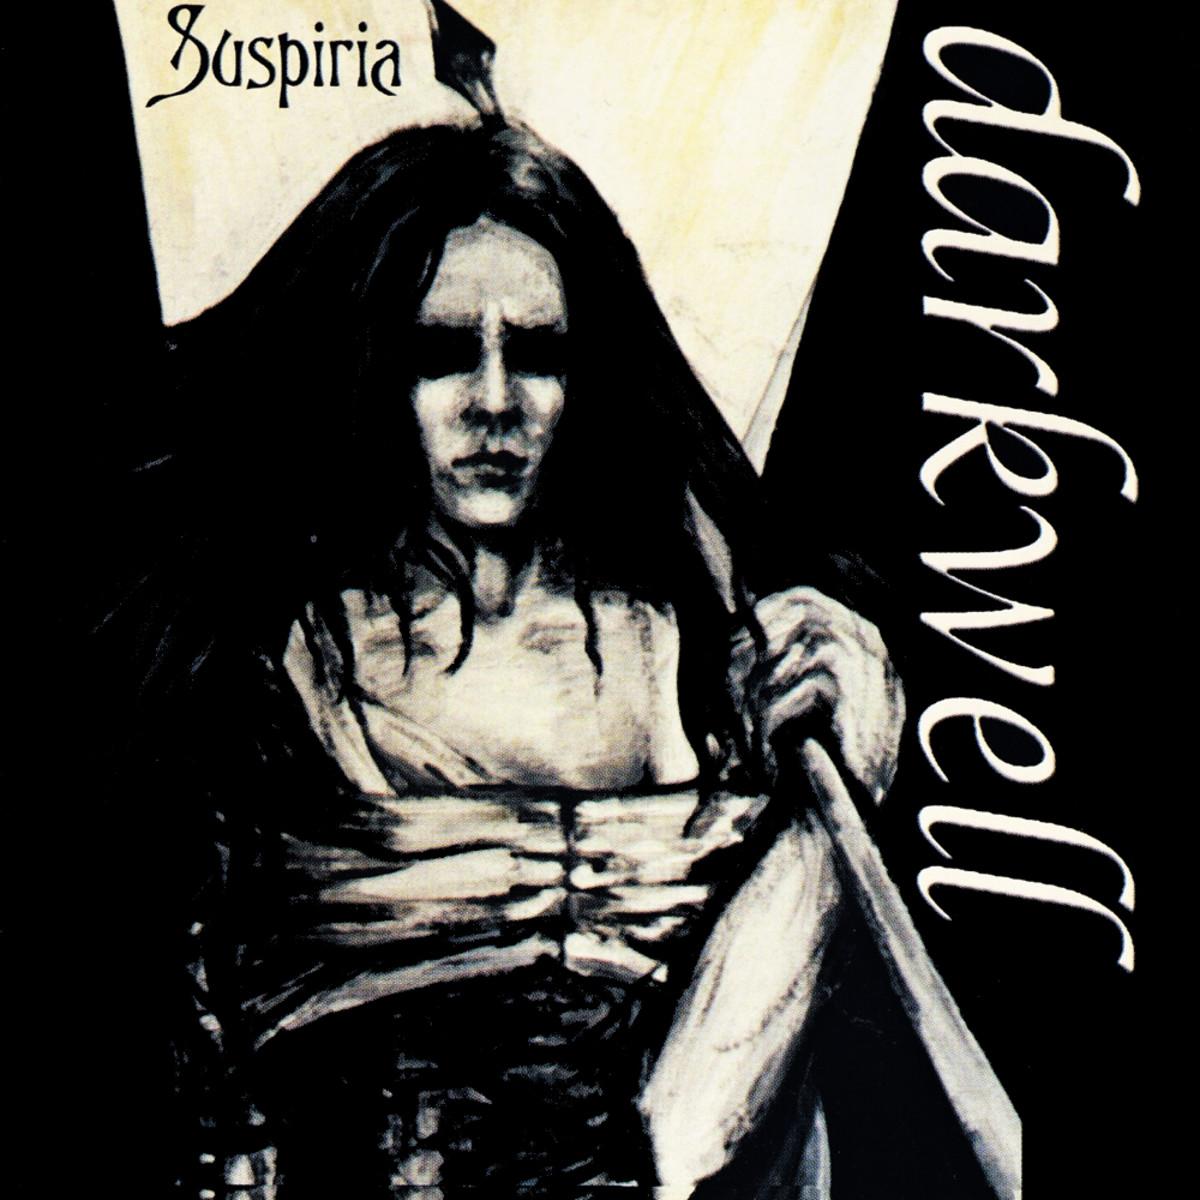 Forgotten Metal Albums: Suspiria by Austrian Gothic Metal Band Darkwell